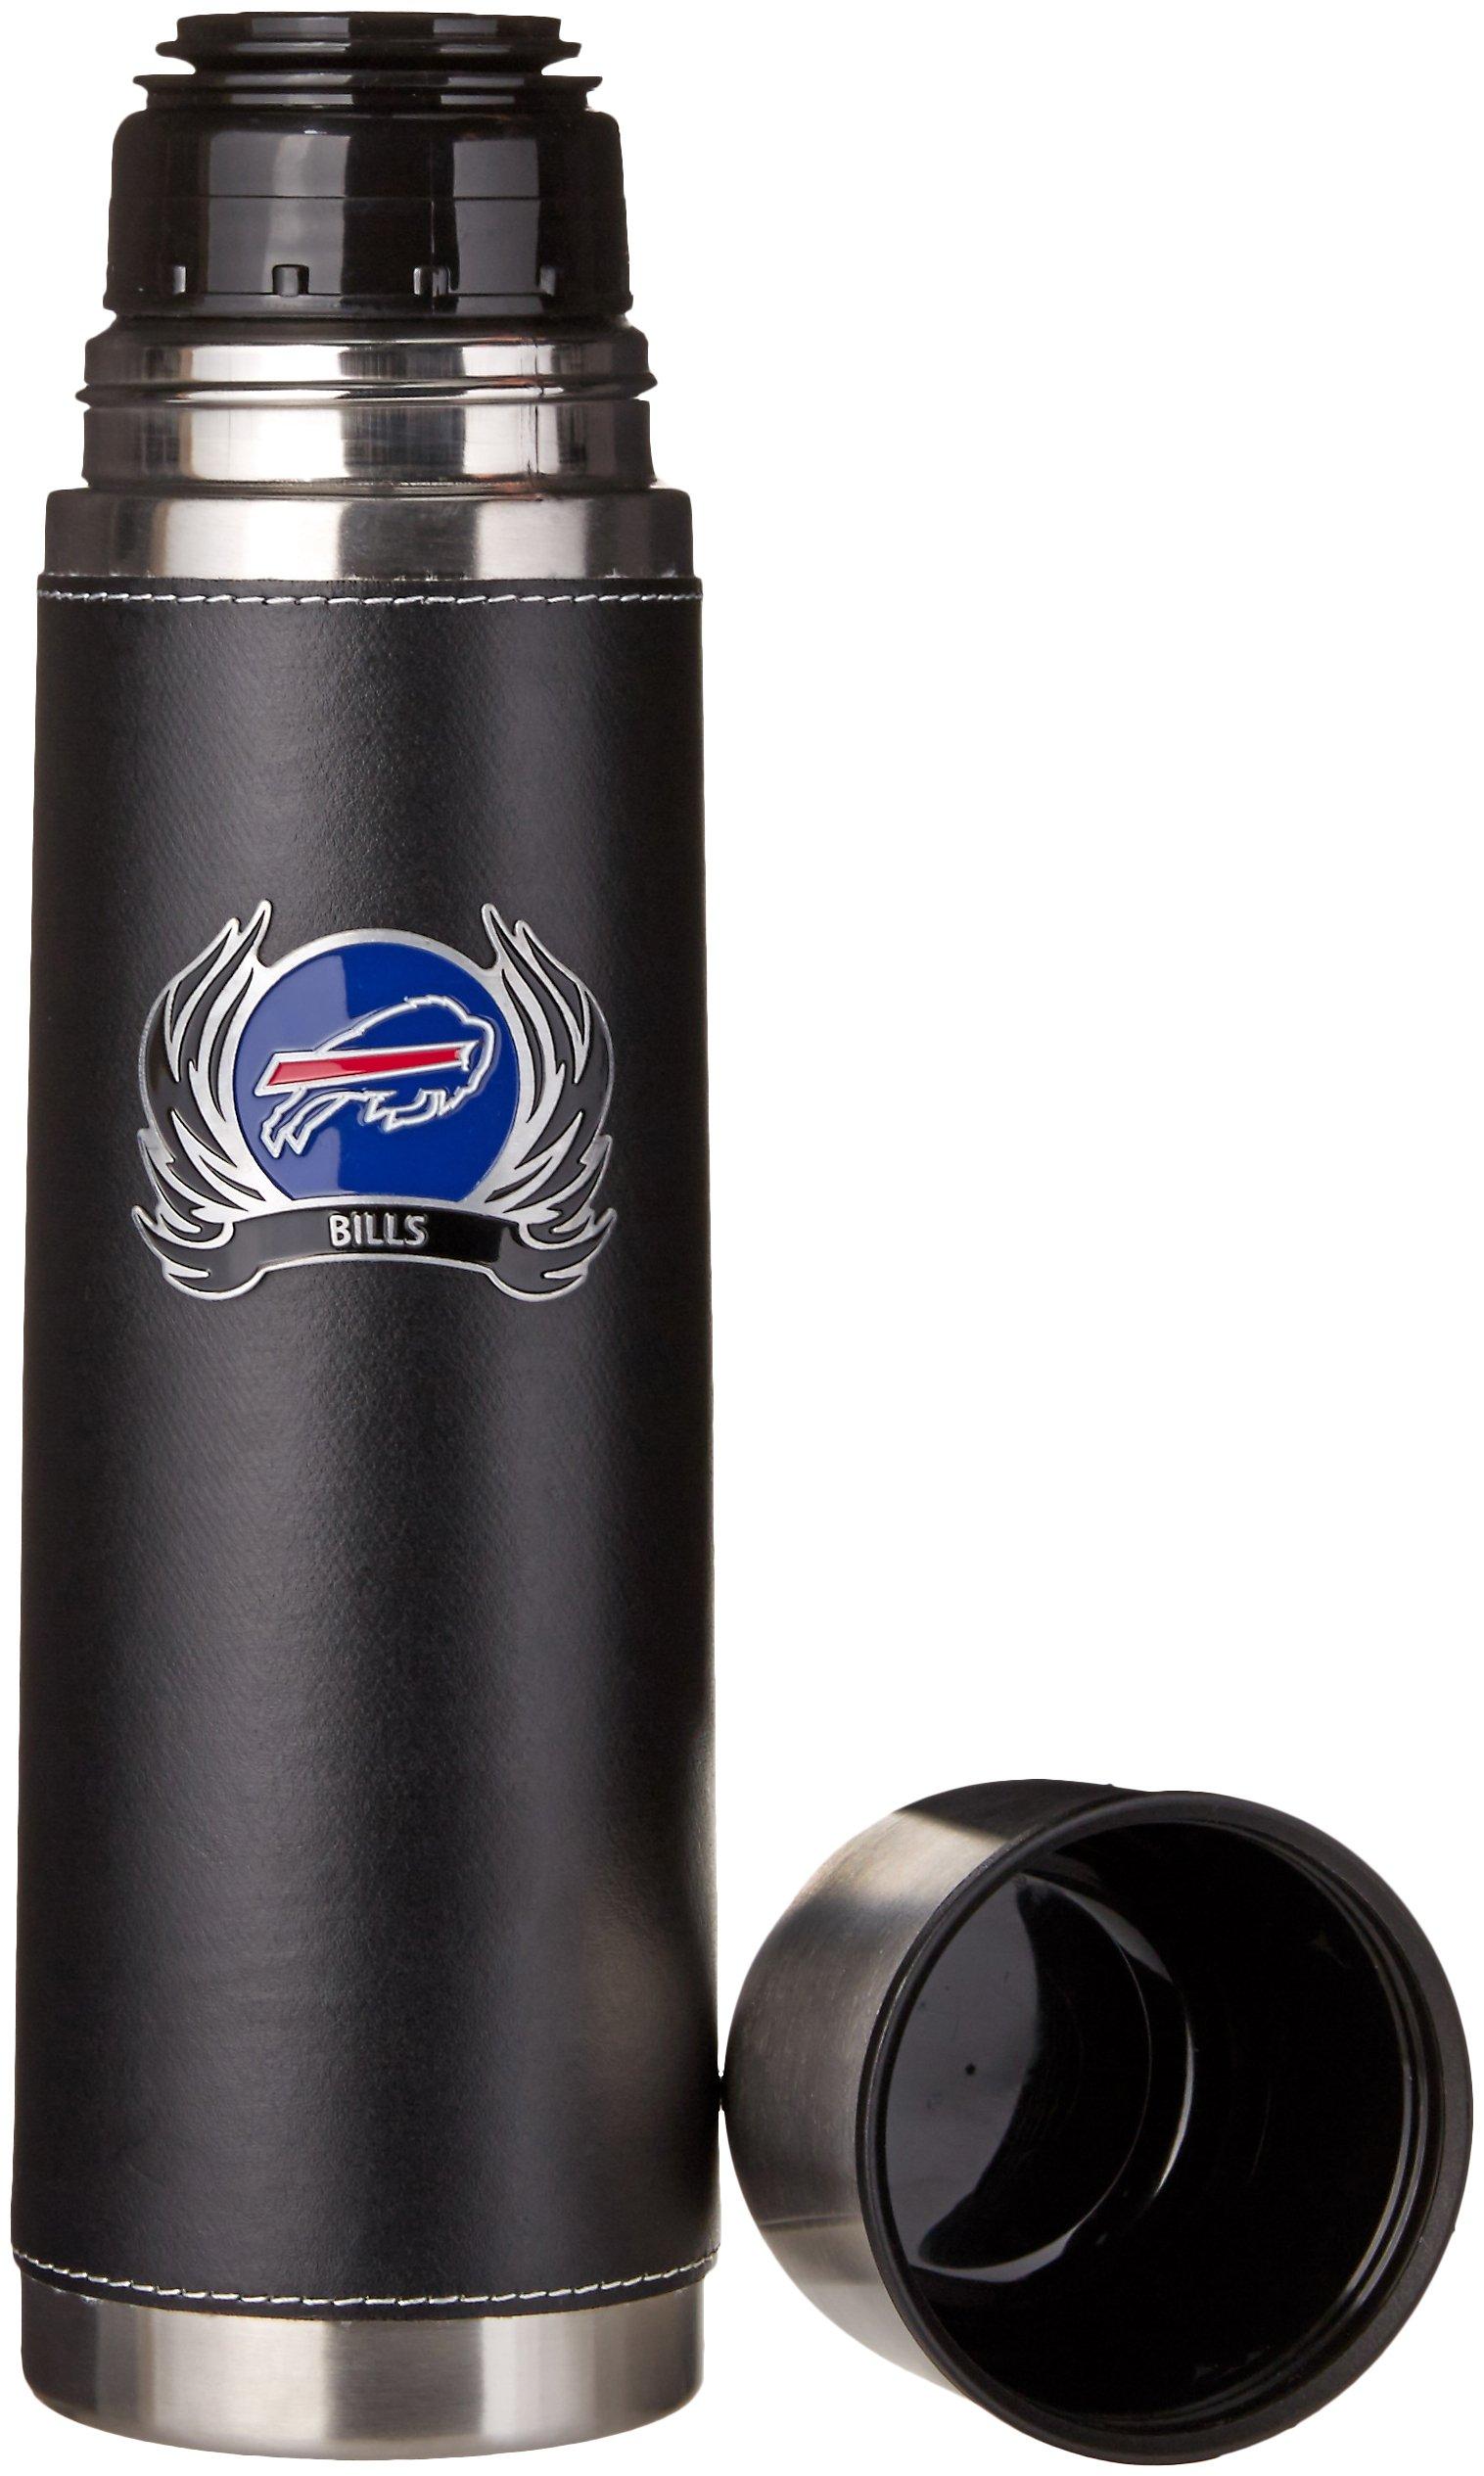 NFL Buffalo Bills Insulated Thermos by Siskiyou